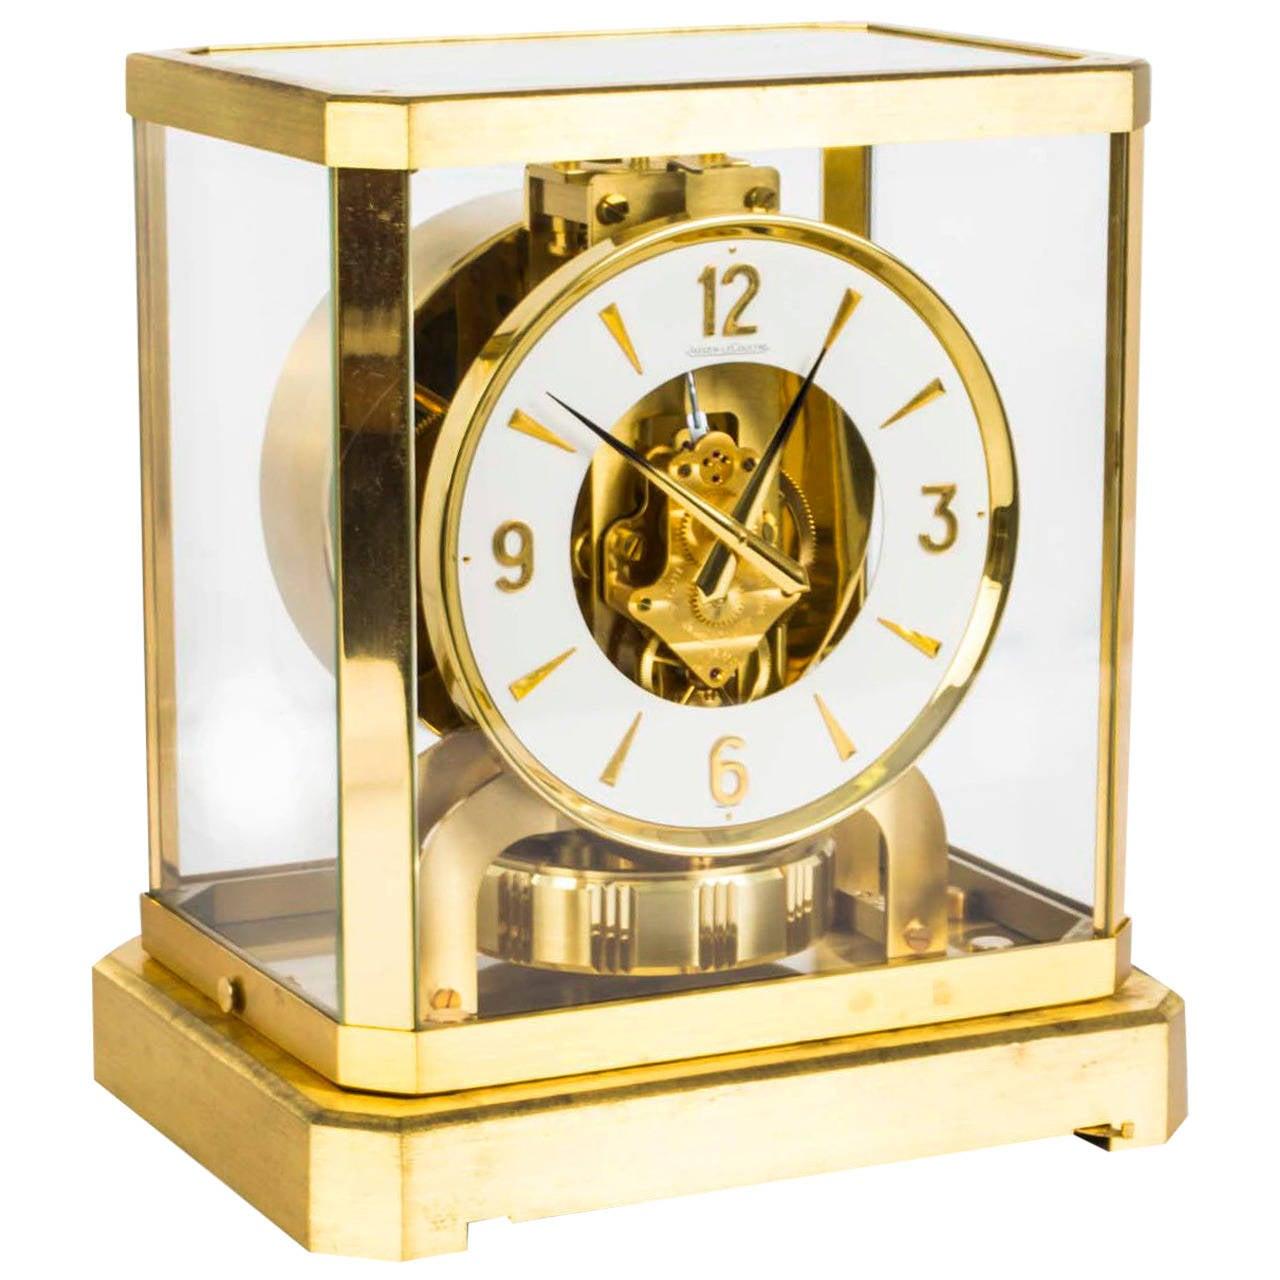 Vintage Atmos Jaeger Le Coultre Mantle Clock Circa 1970